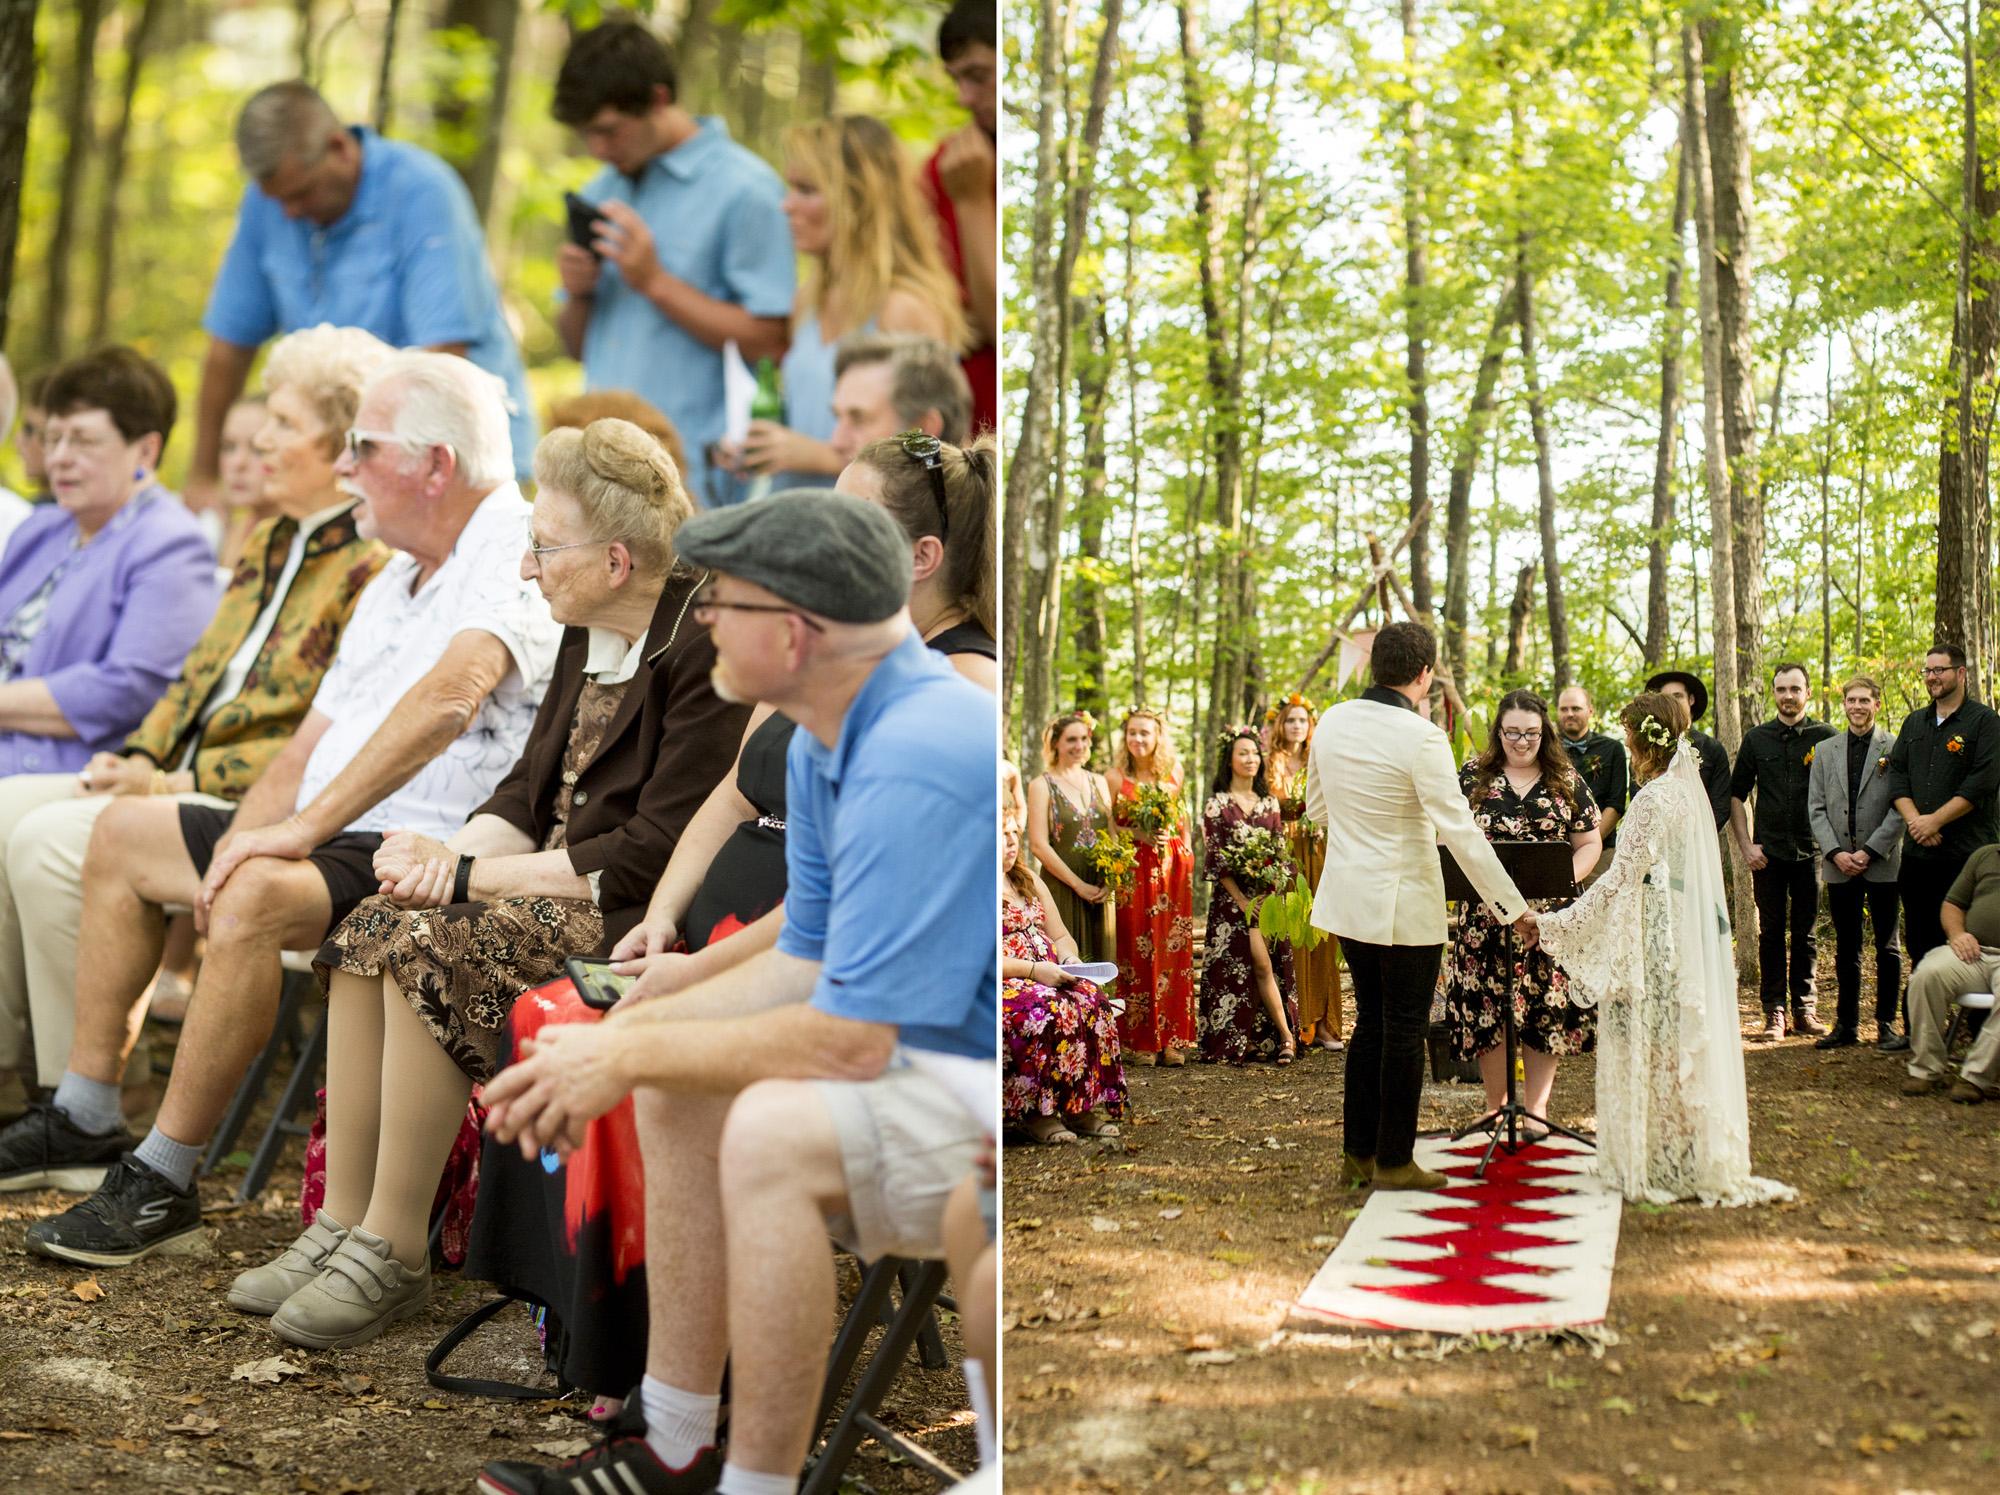 Seriously_Sabrina_Photography_Red_River_Gorge_Kentucky_Wedding_ShawnDana117.jpg